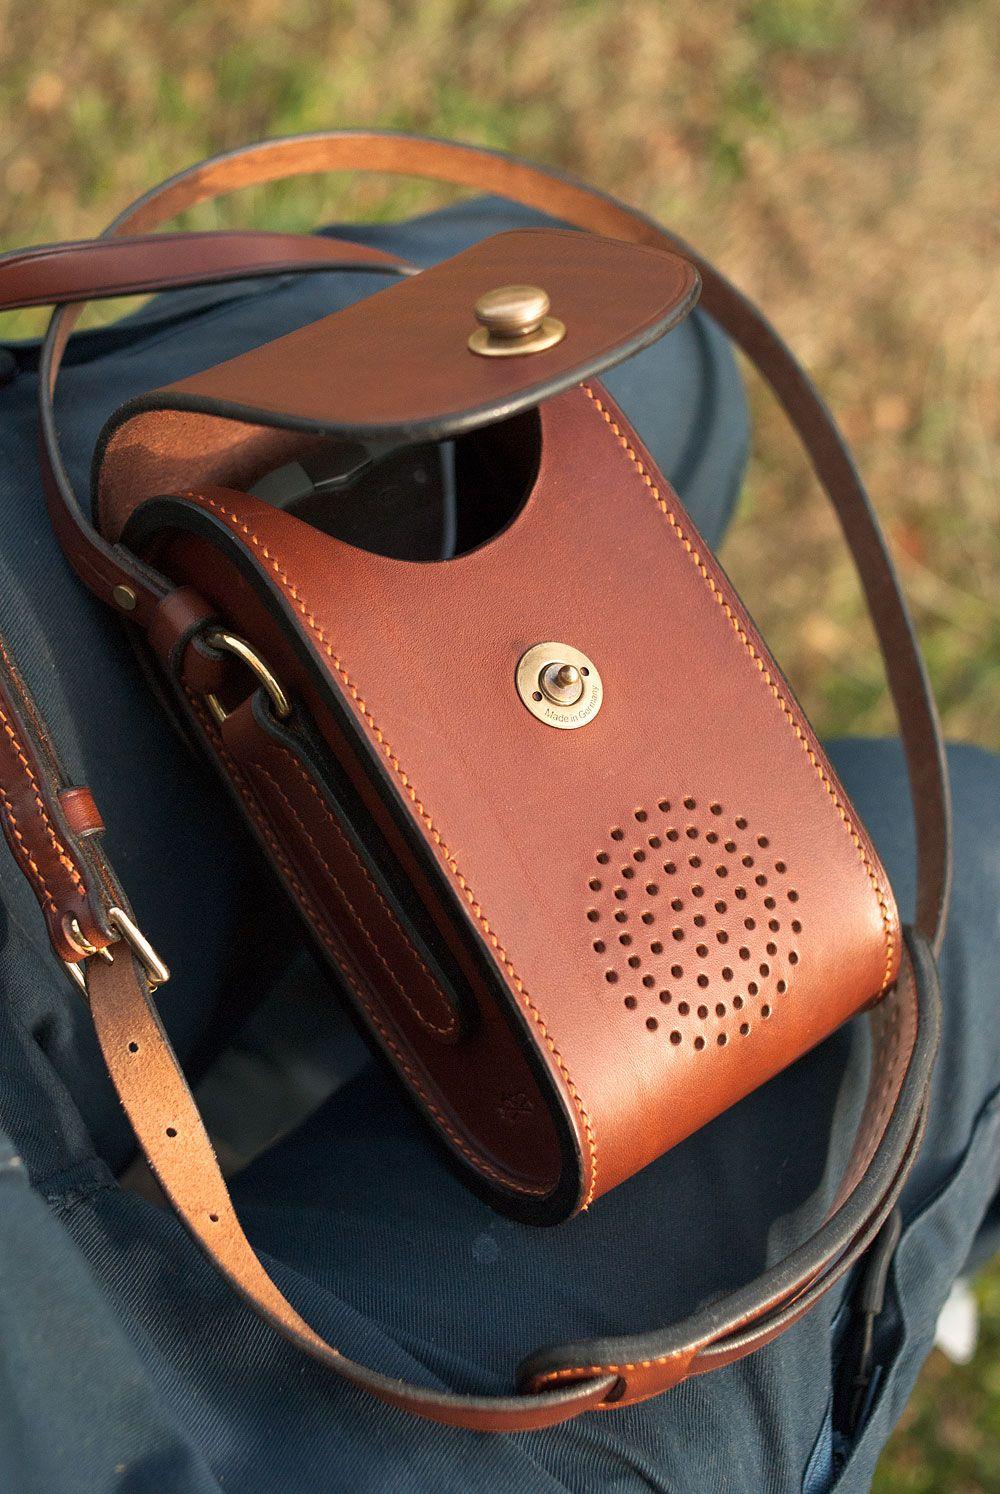 Epingle Sur Subdivise Objets En Cuir Handcrafted Leather Goods